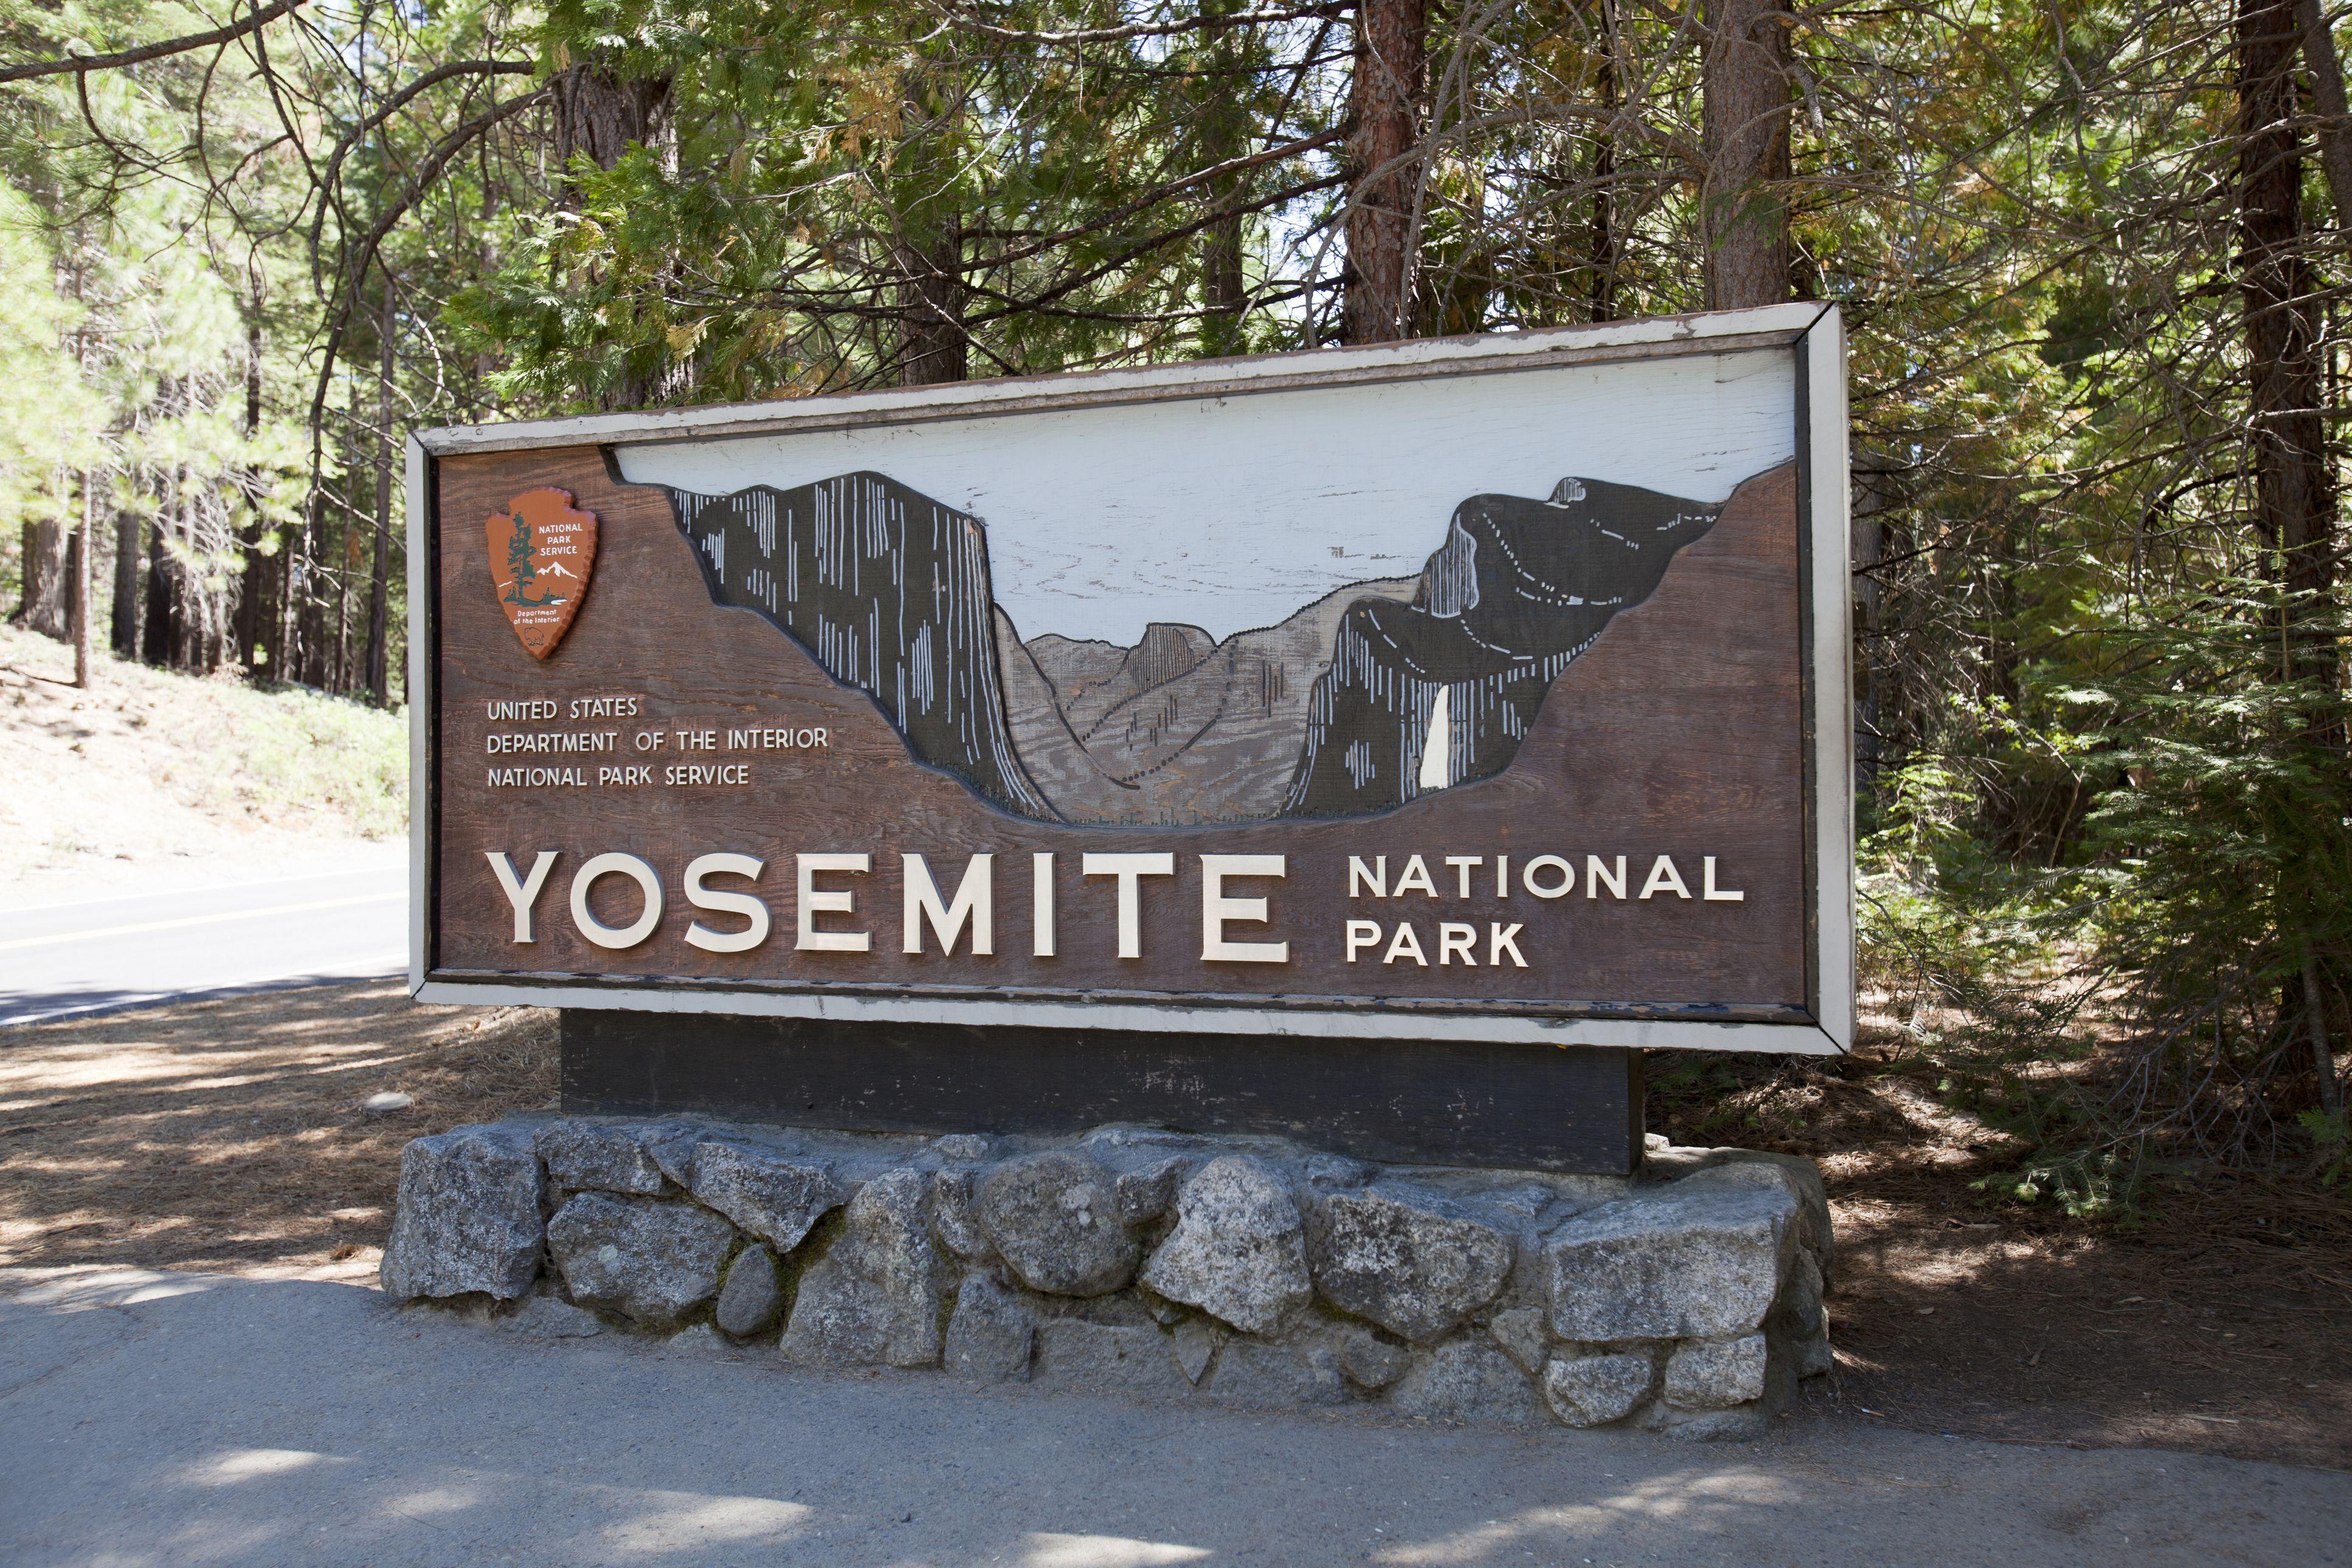 How to Spend a Day in Yosemite Yosemite National Park Map Of Landmark Signs on long beach landmarks, bakersfield landmarks, west point landmarks, abraham lincoln landmarks, ohio landmarks, mojave desert landmarks, maryland landmarks, grand canyon landmarks, san jose landmarks, new york landmarks, mountain basin region landmarks, cajun country landmarks, susanville landmarks, anaheim landmarks, long island landmarks,